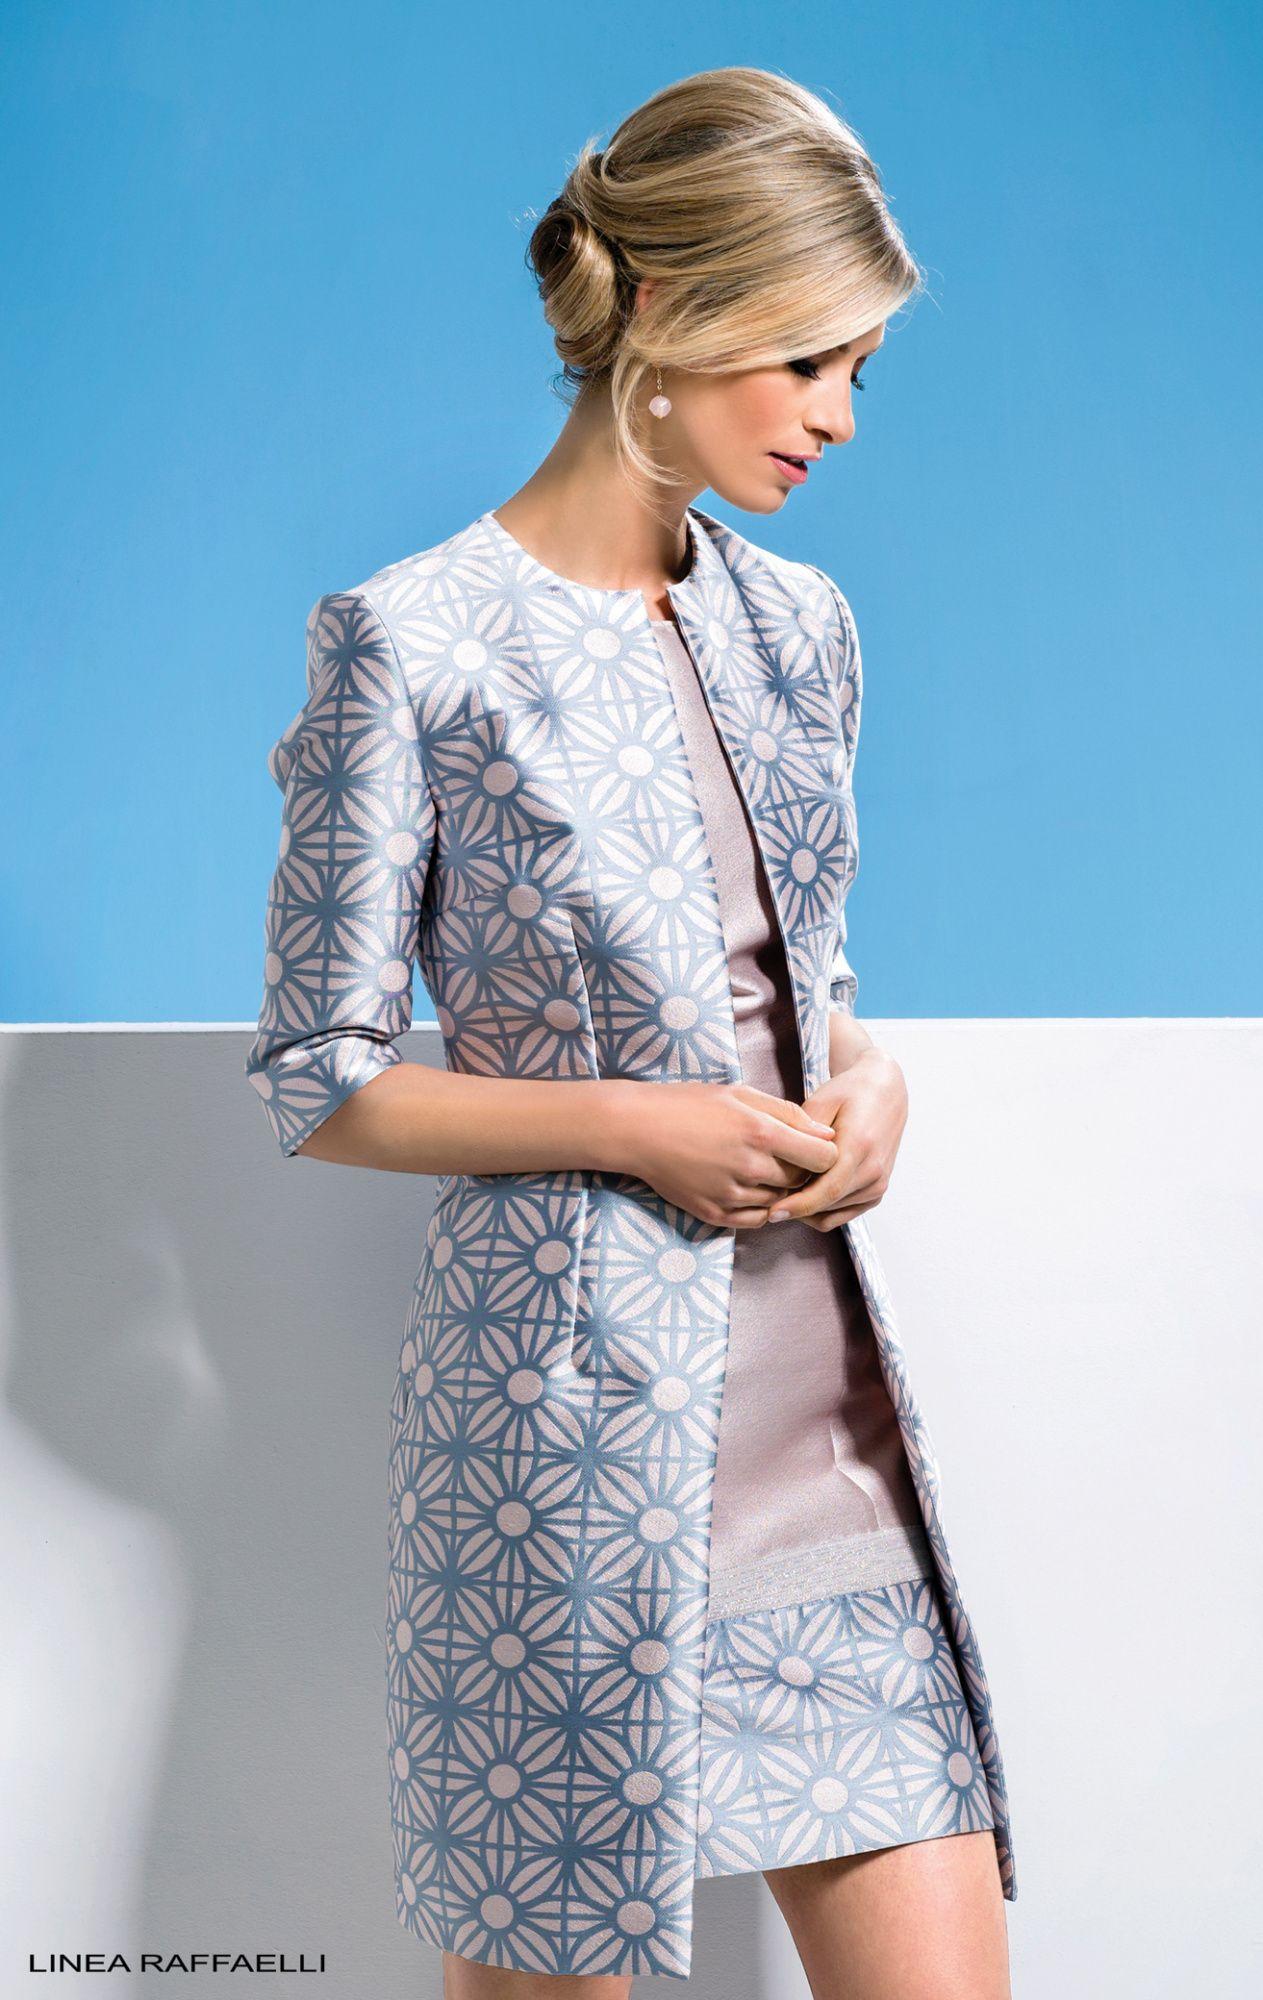 Linea Raffaelli dress 171-681-01 set 047, resort collection 2018 ...